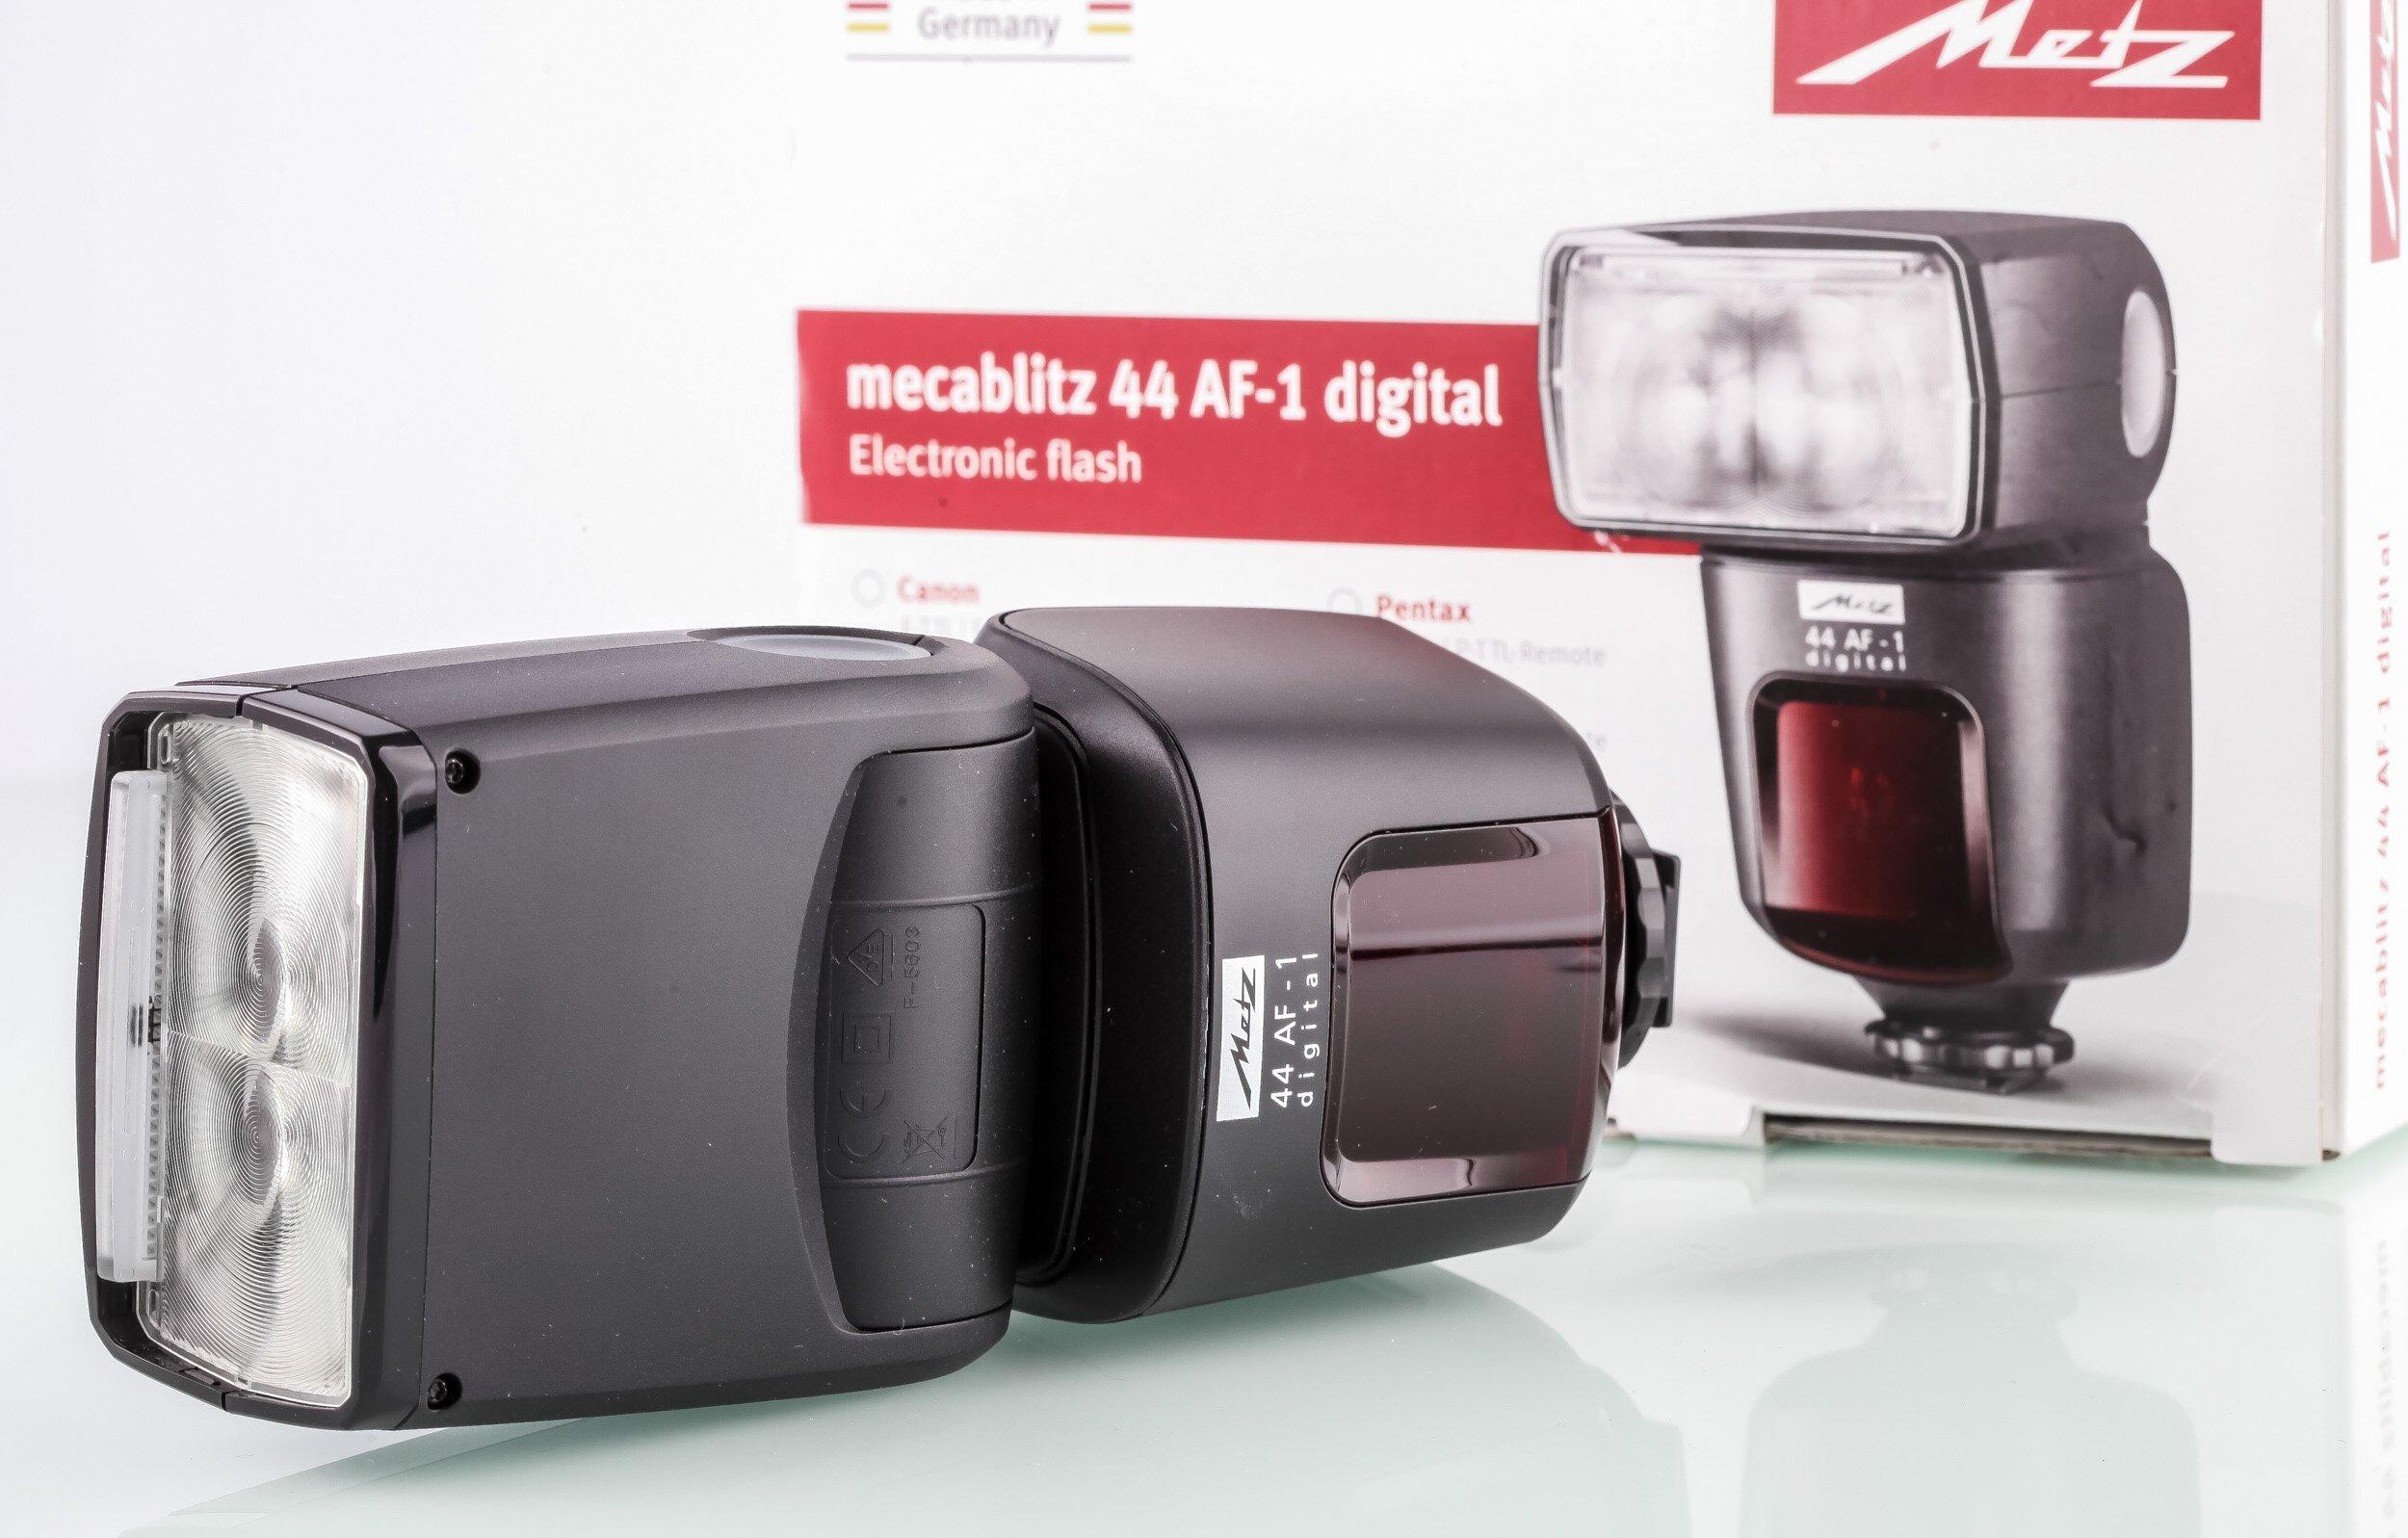 Metz mecablitz 44 AF-1 digital für Olympus/Leica/Panasonic